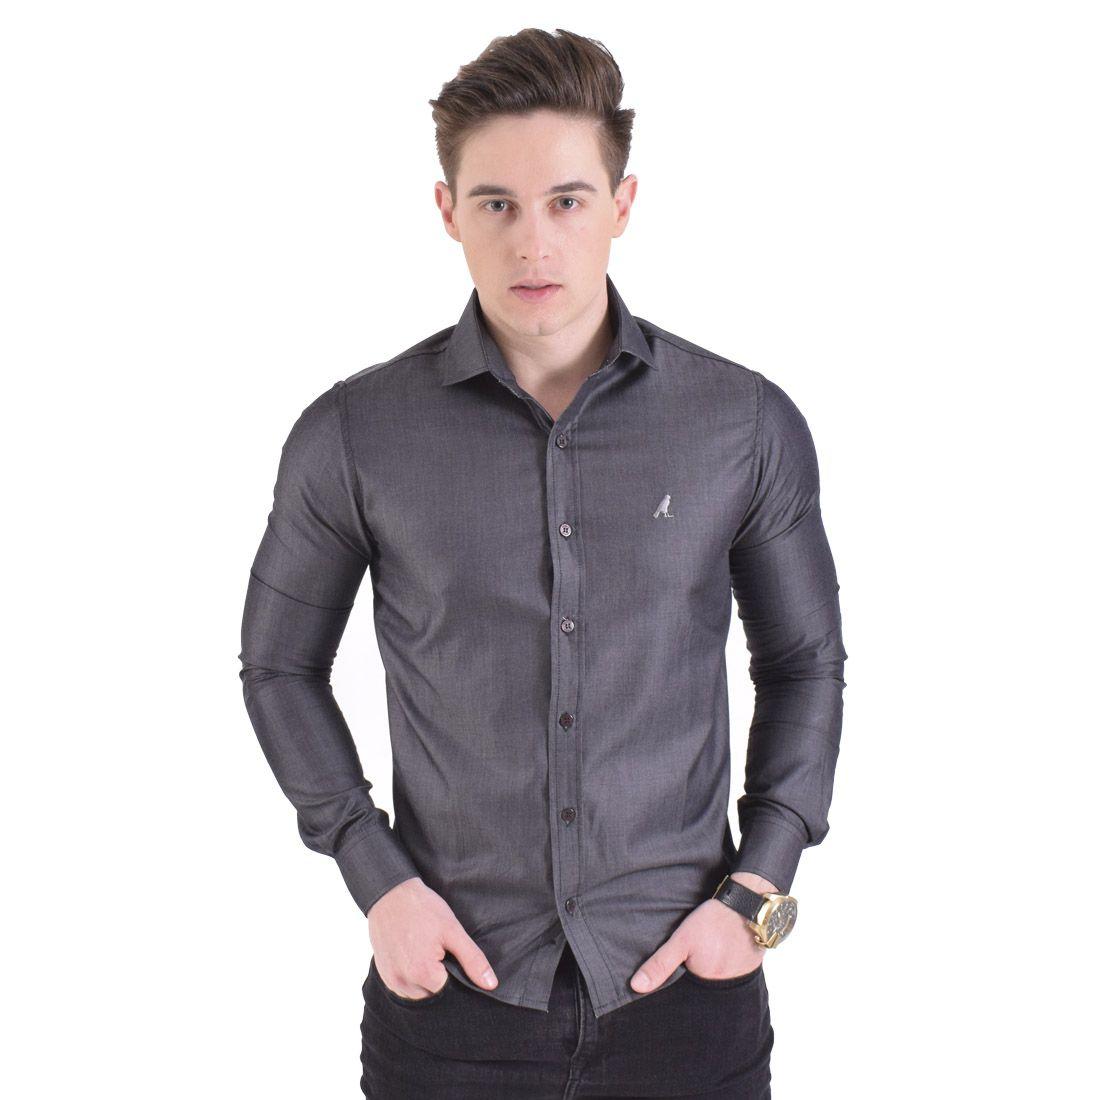 100253- Camisa Social Cinza Escuro Masculina Slim - LEVOK